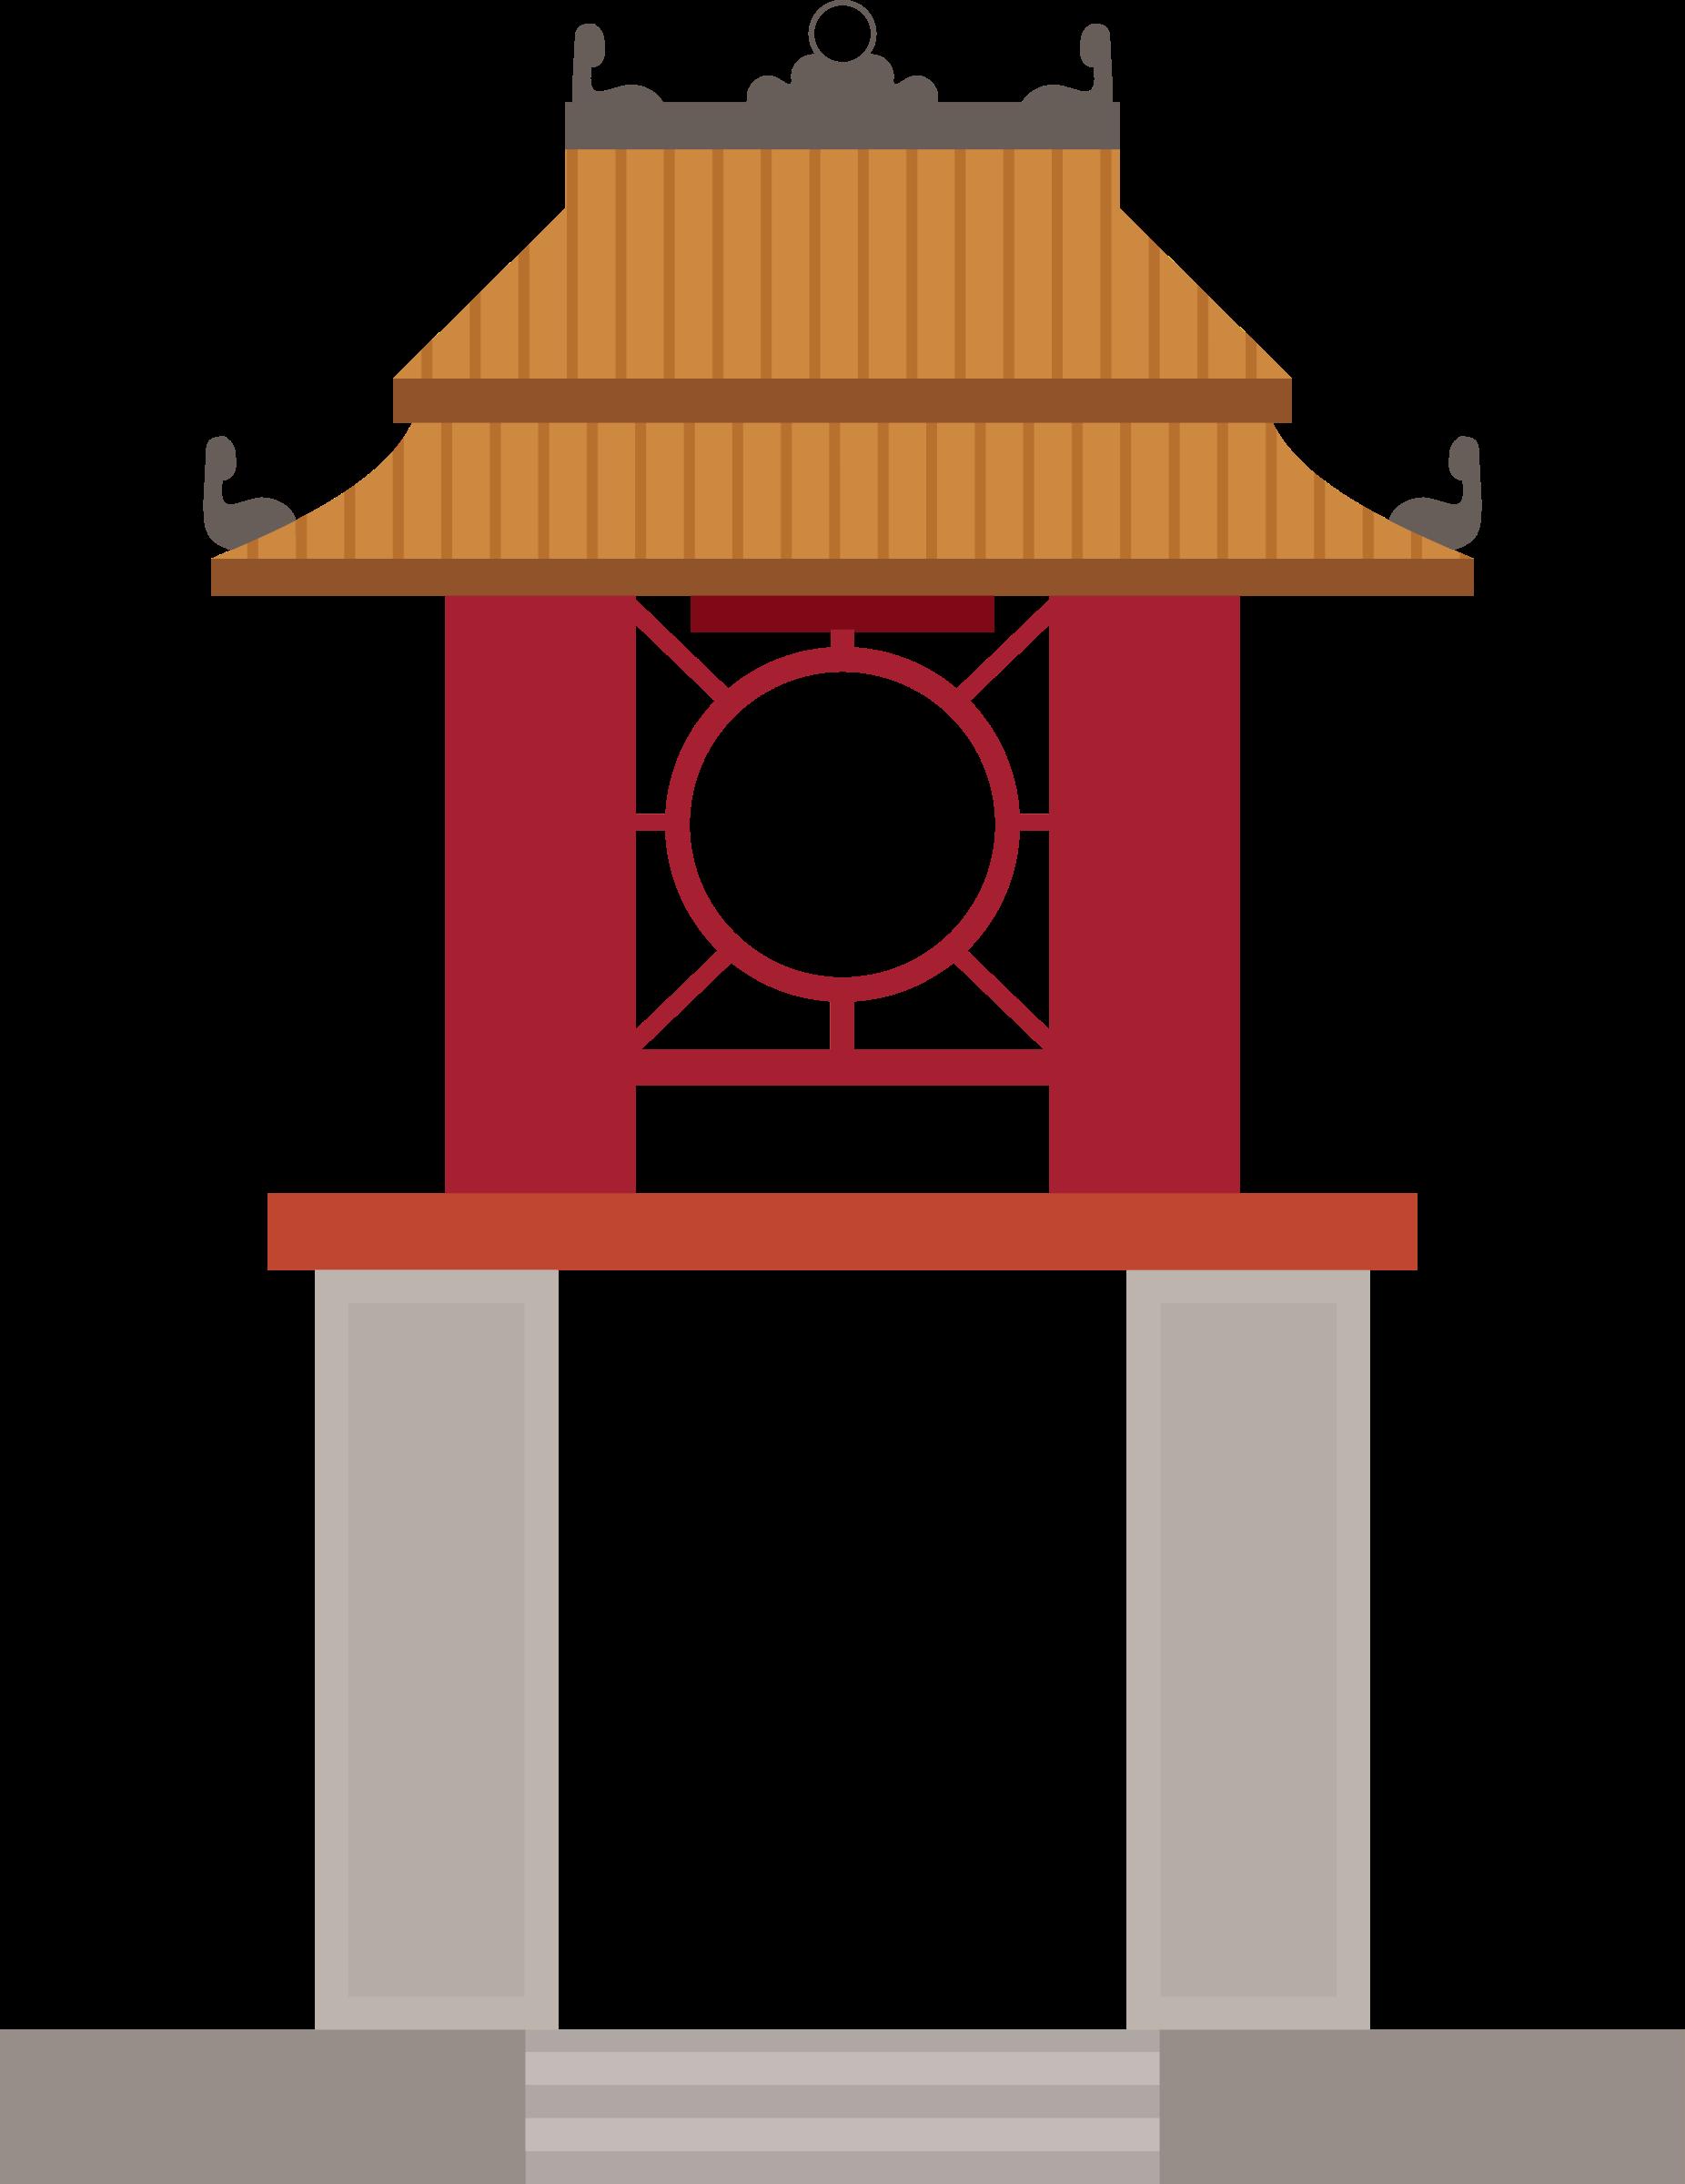 Khue van pavilion big. Tower clipart present